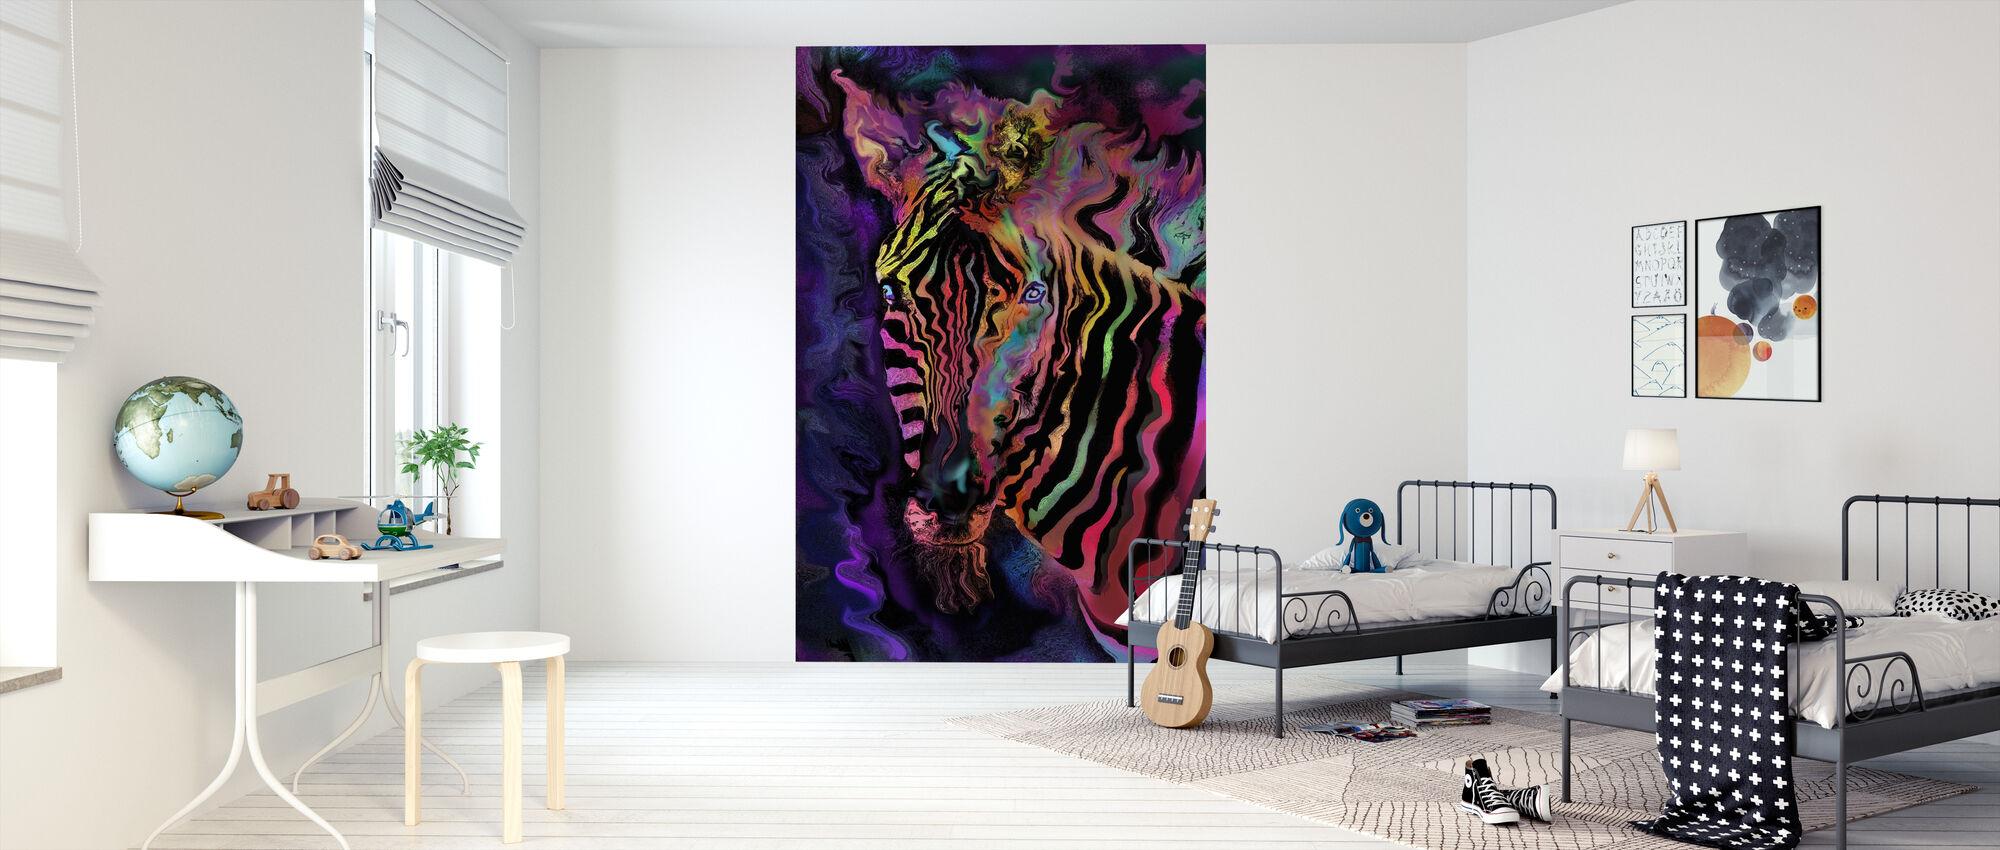 Regenboog Zebra - Behang - Kinderkamer